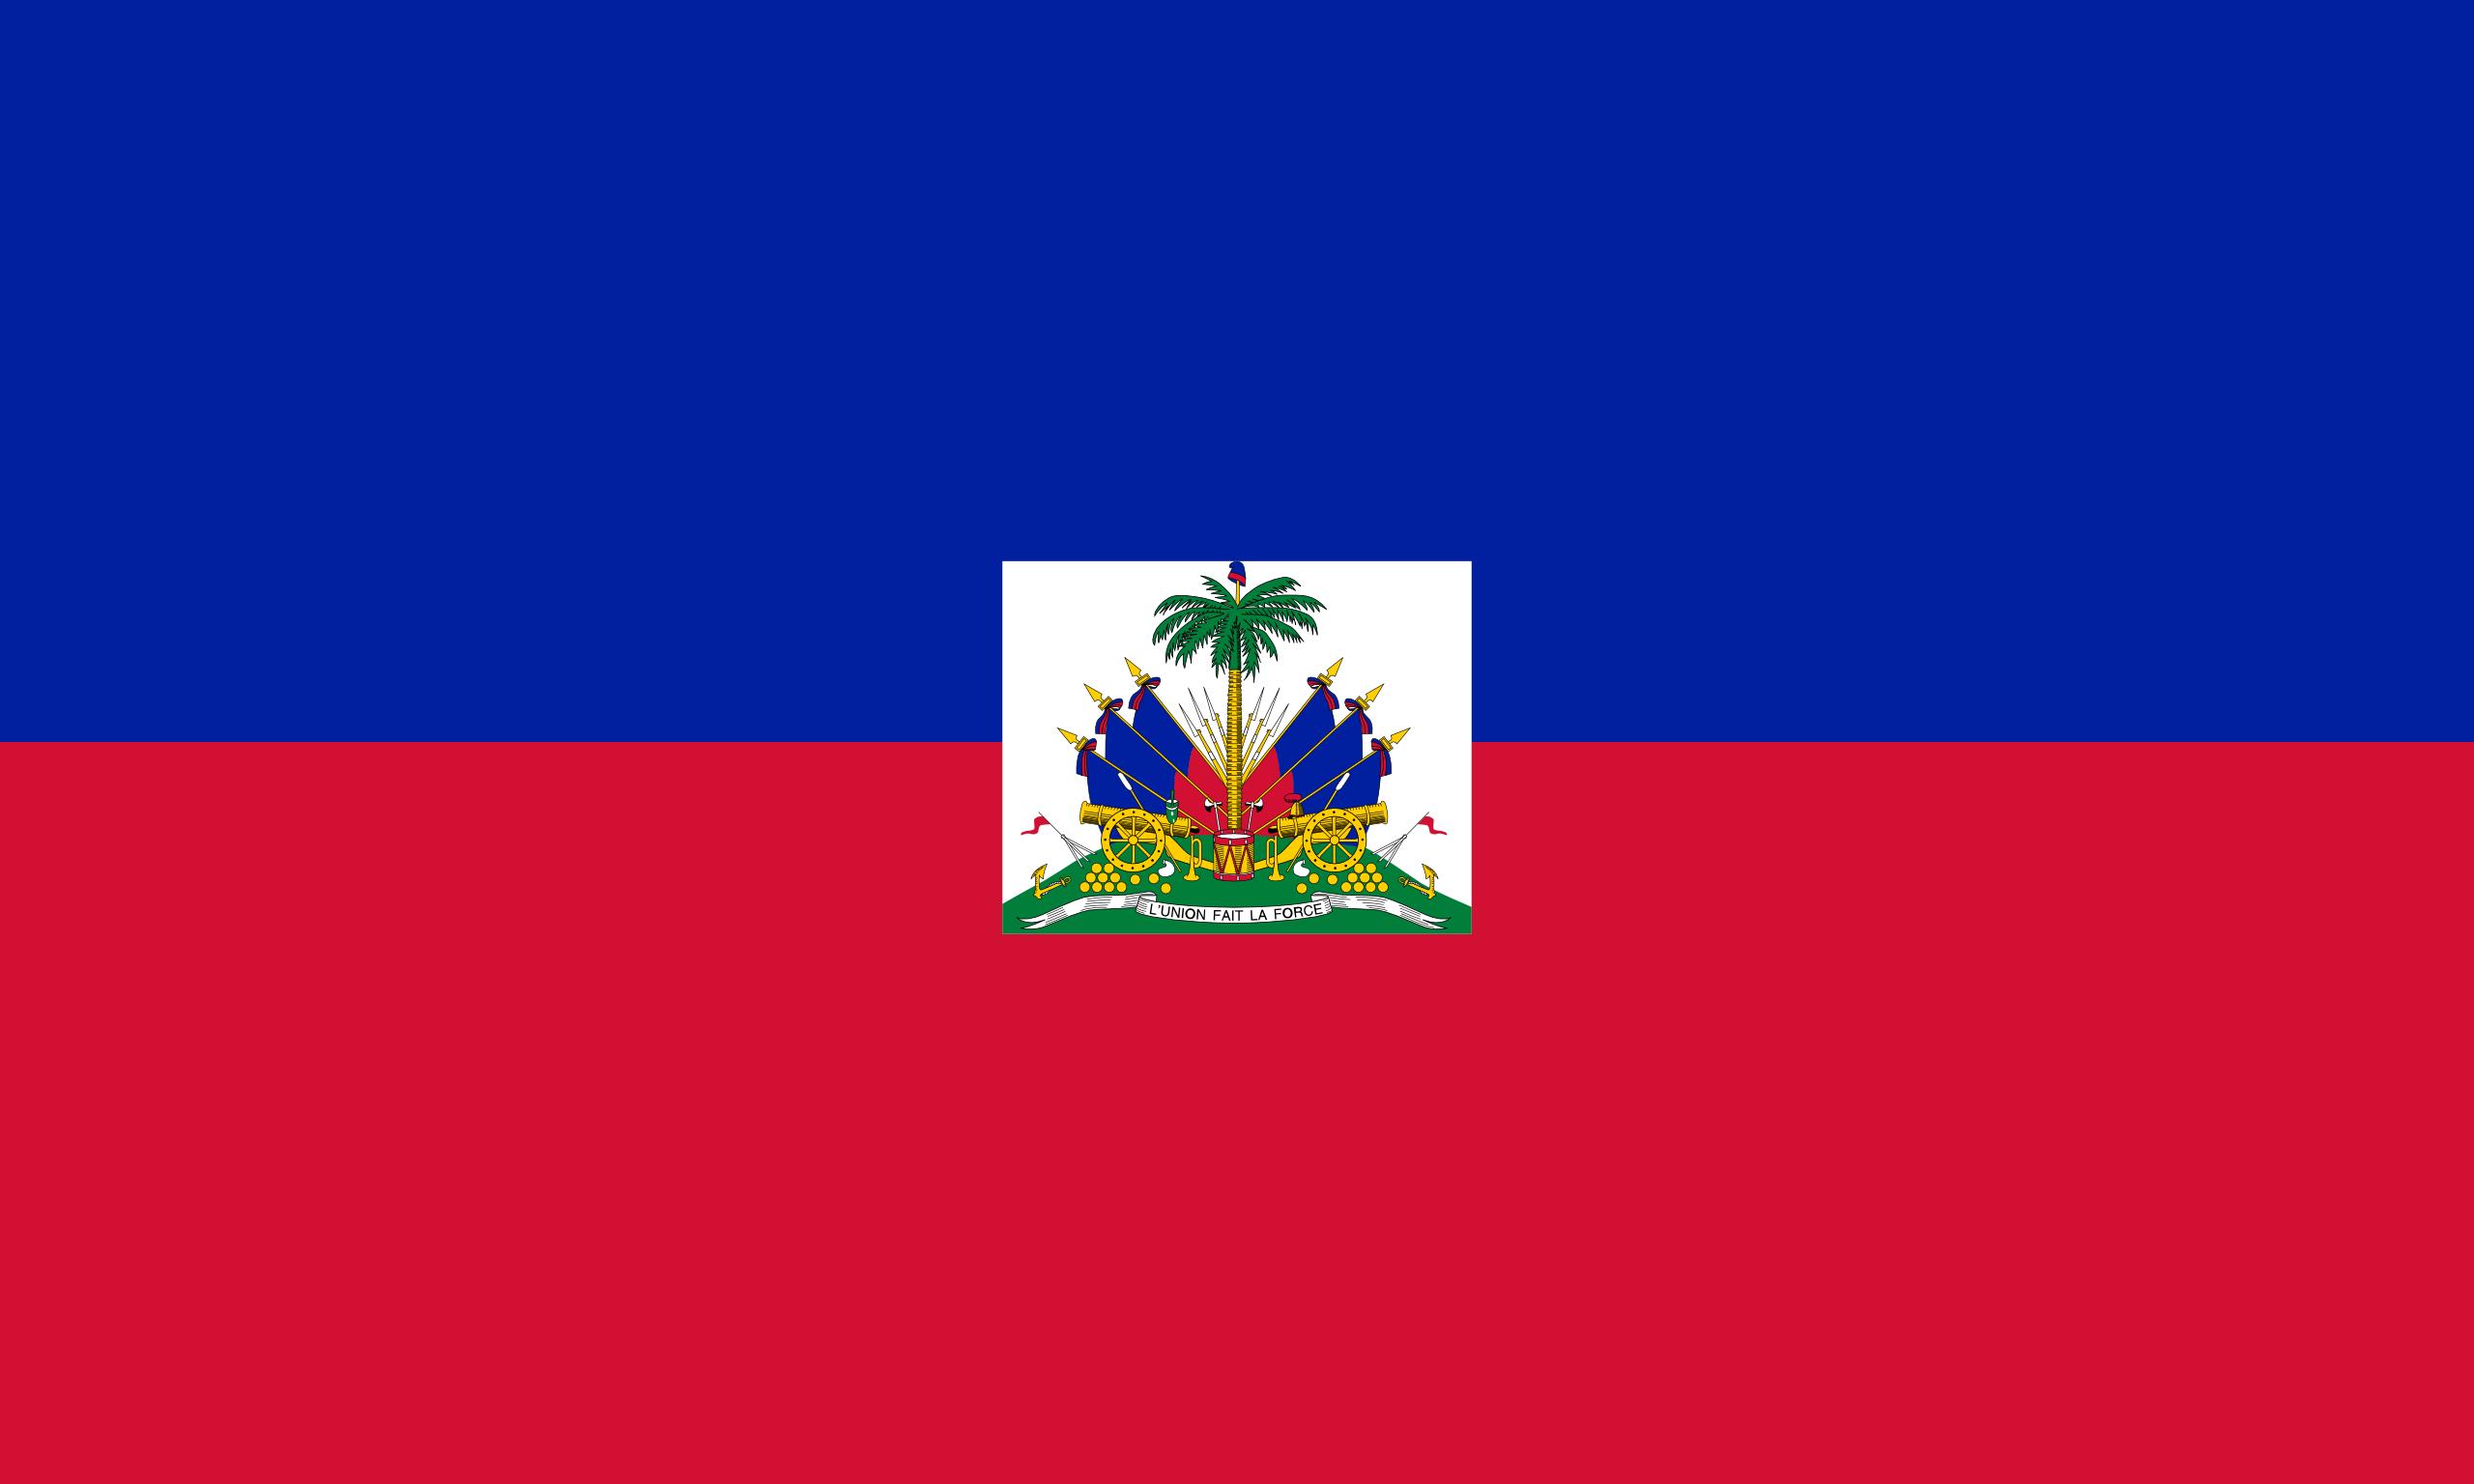 a26a8e9cb13d3 Haiti. Jovenel Moïse é eleito presidente - Instituto Humanitas Unisinos -  IHU